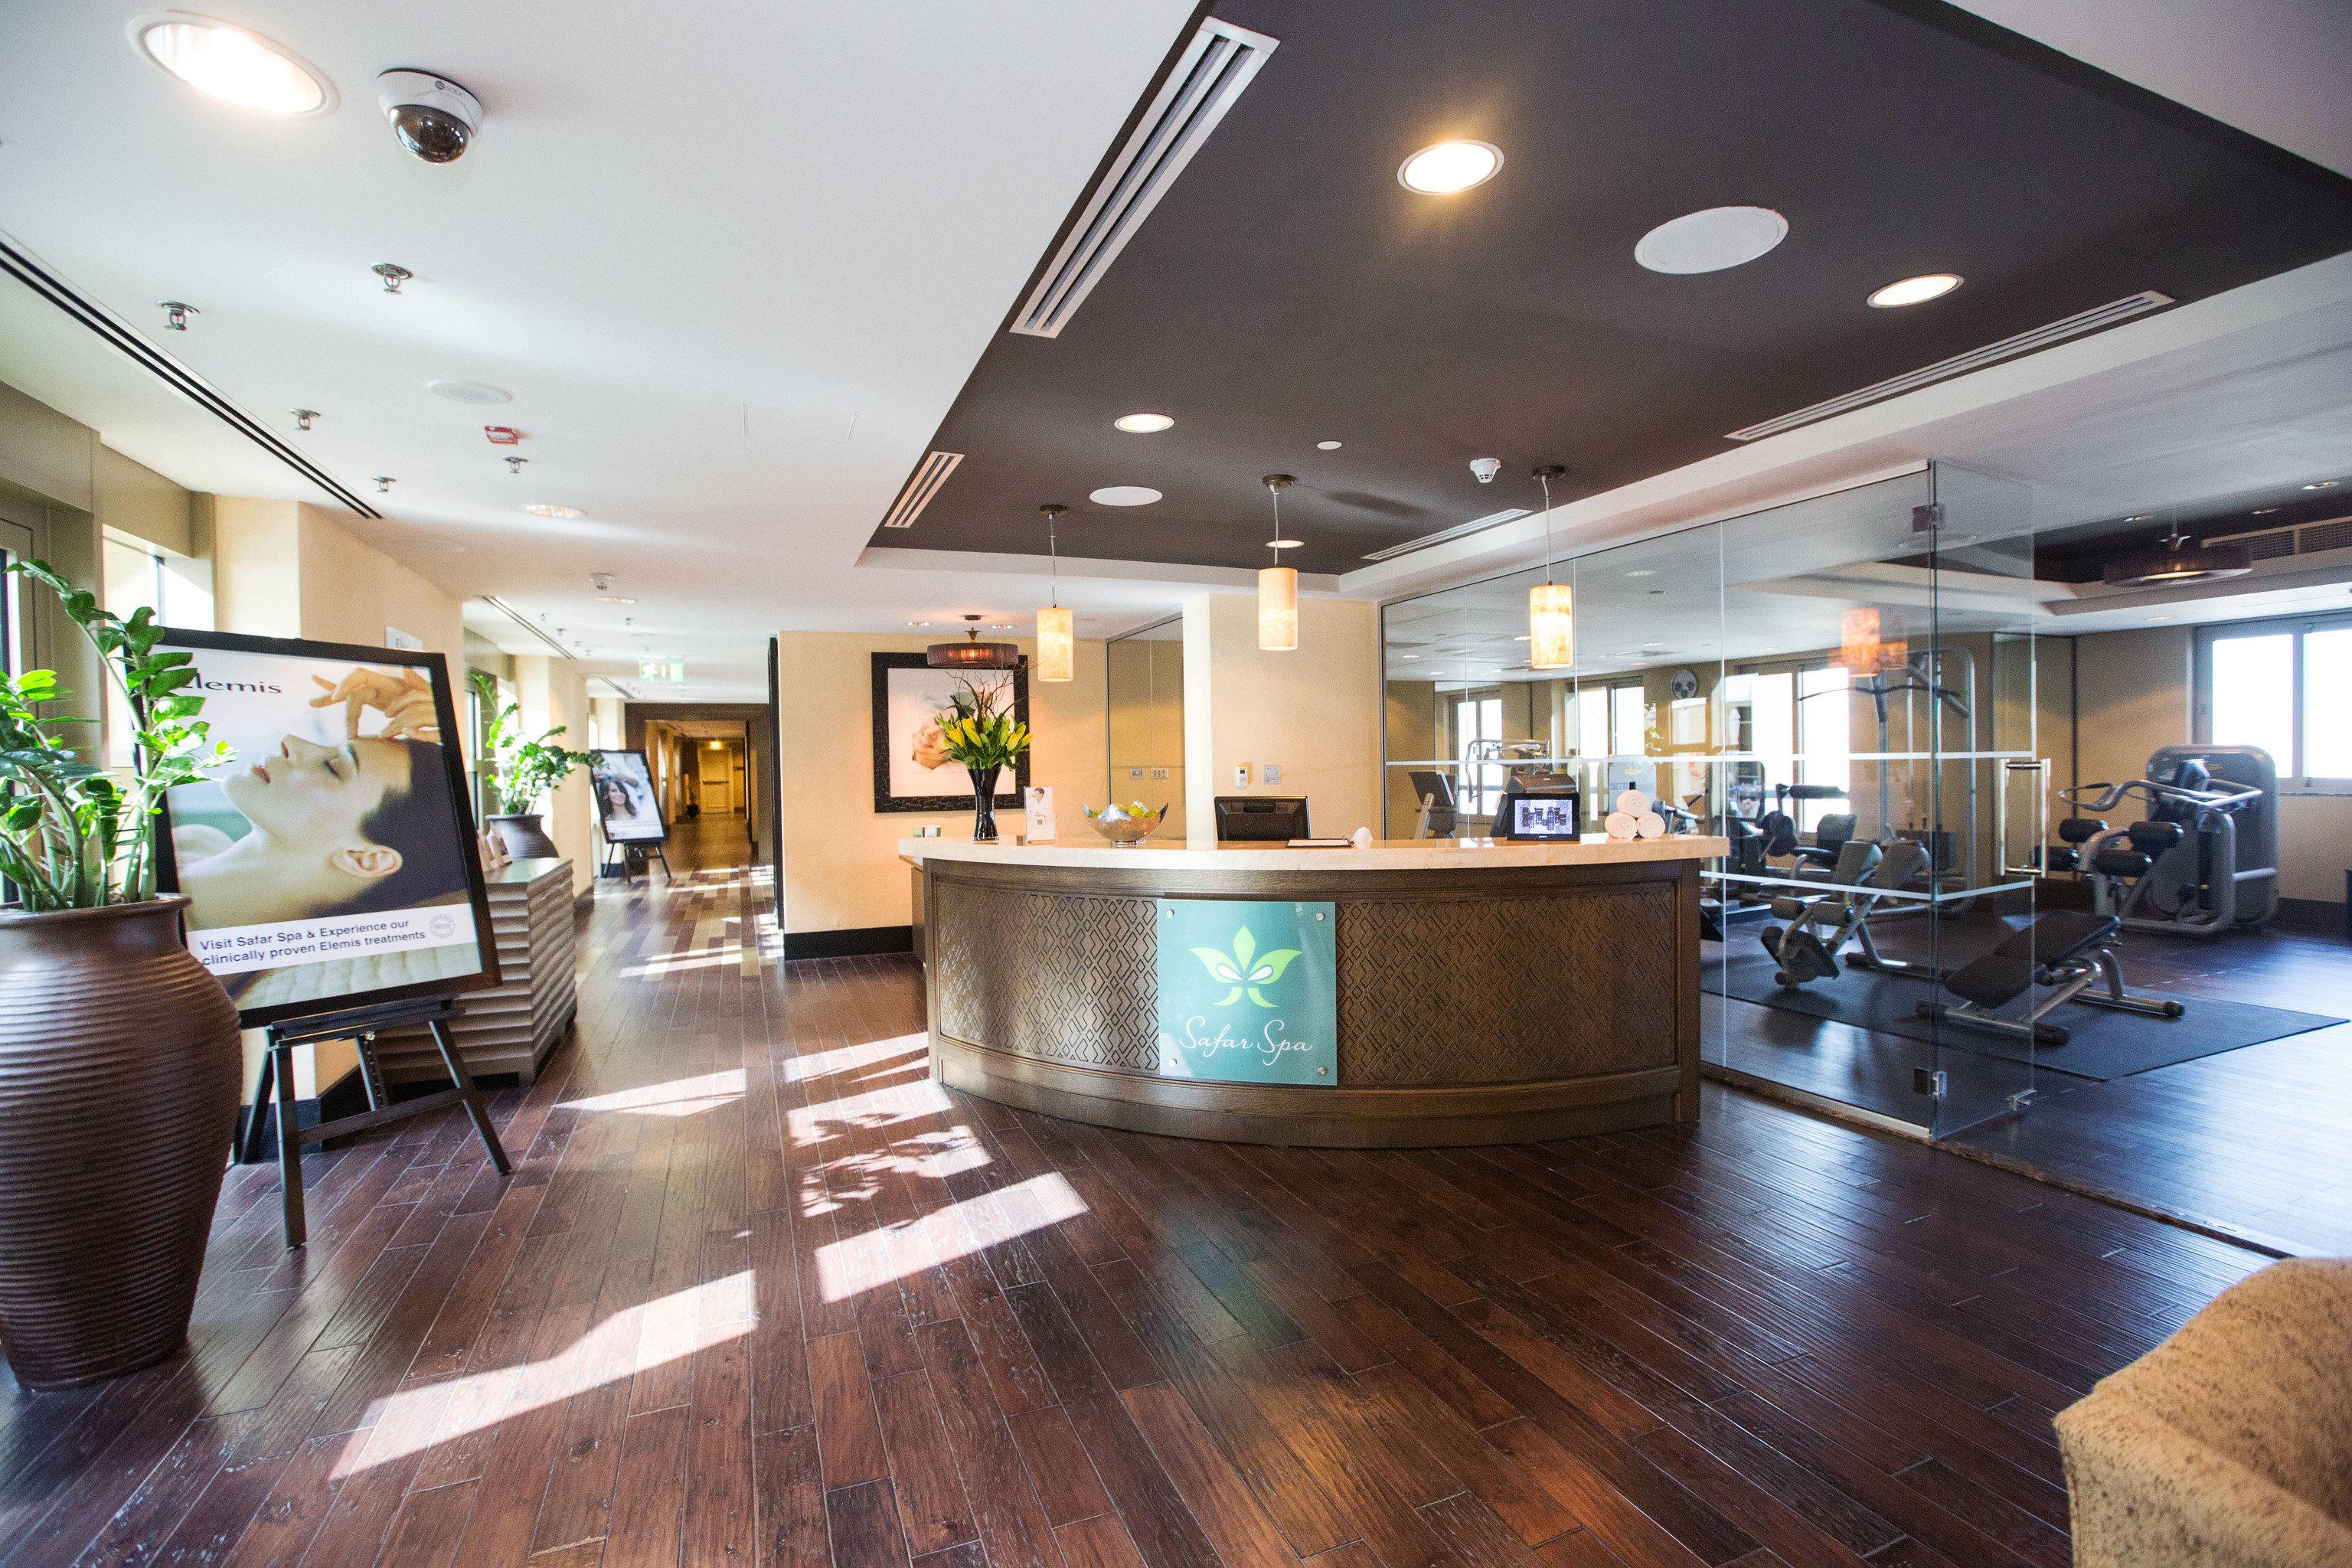 Lobby building property home hard living room condominium headquarters